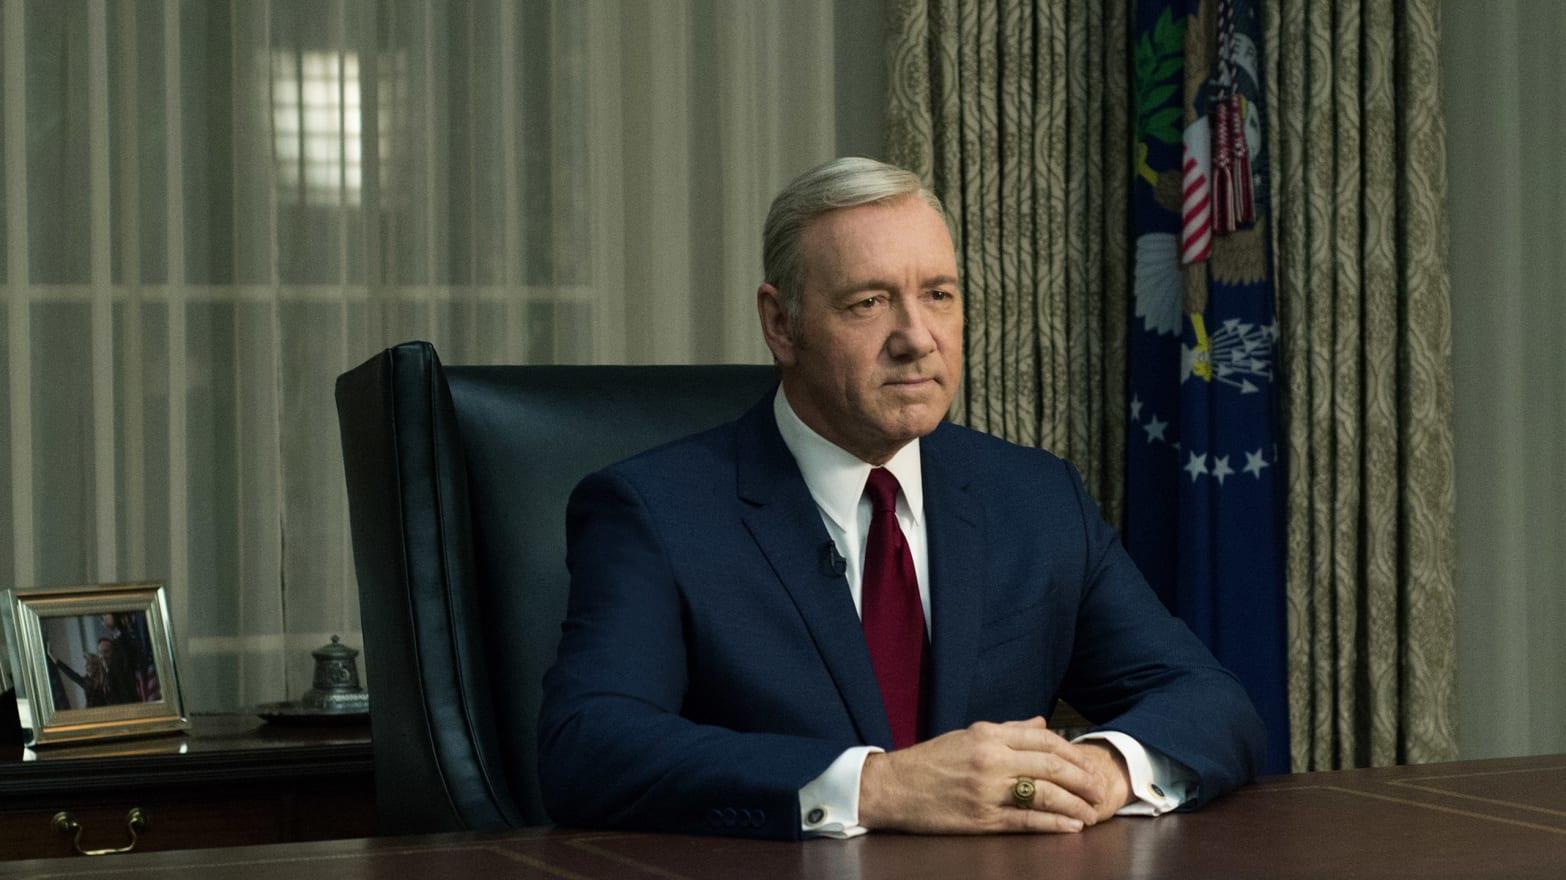 House Of Cards Season 4 S Donald Trump Connection A Kkk Scandal